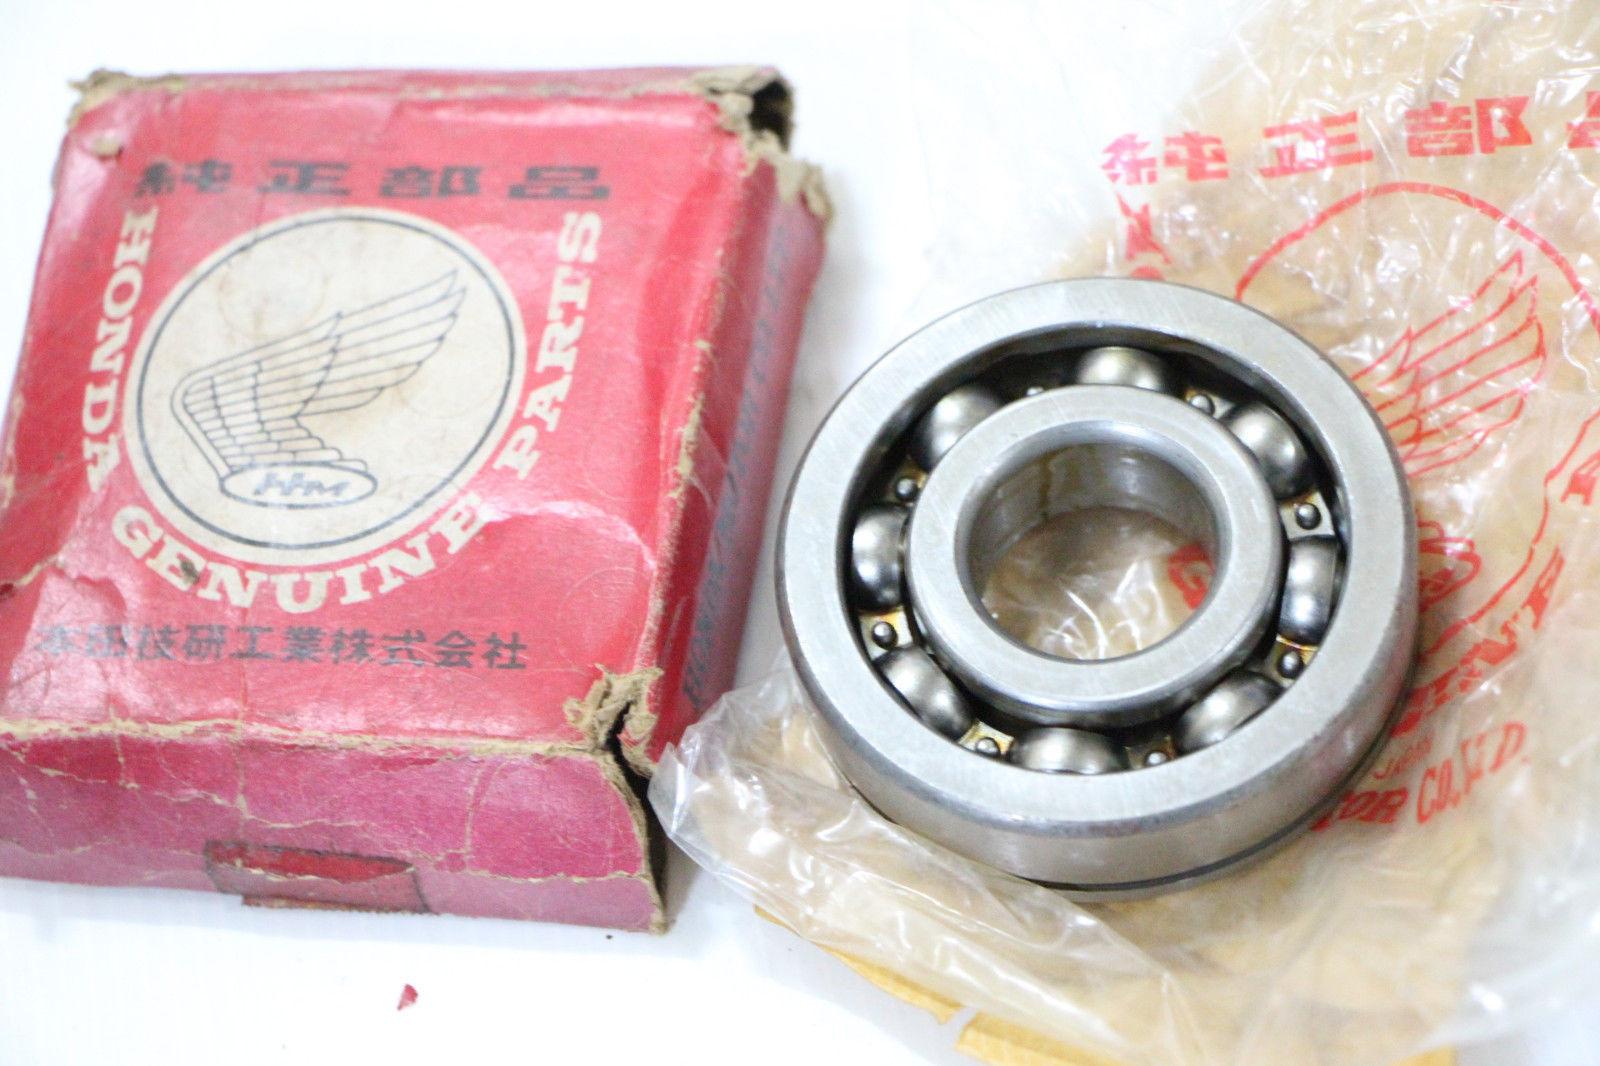 Honda F190 Rotavator Lawn 2 Wheel Tractors Ball bearing 6305NS-1 91001-701-000